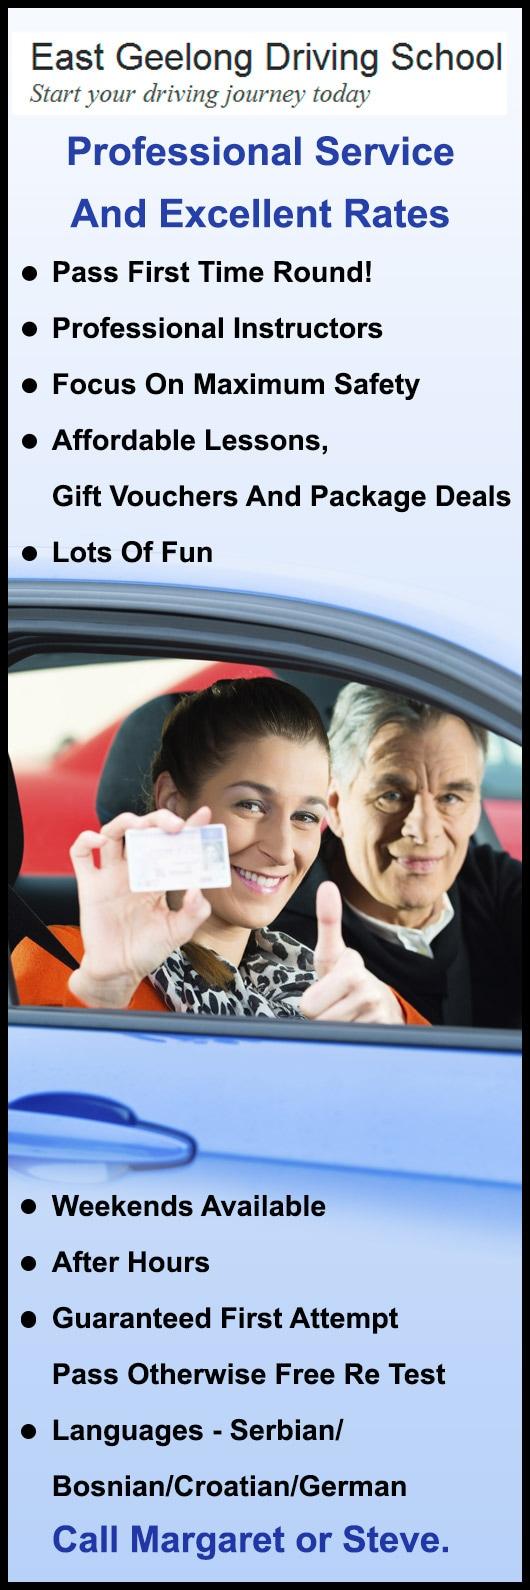 East Geelong Driving School - Driving Lessons & Schools - East Geelong